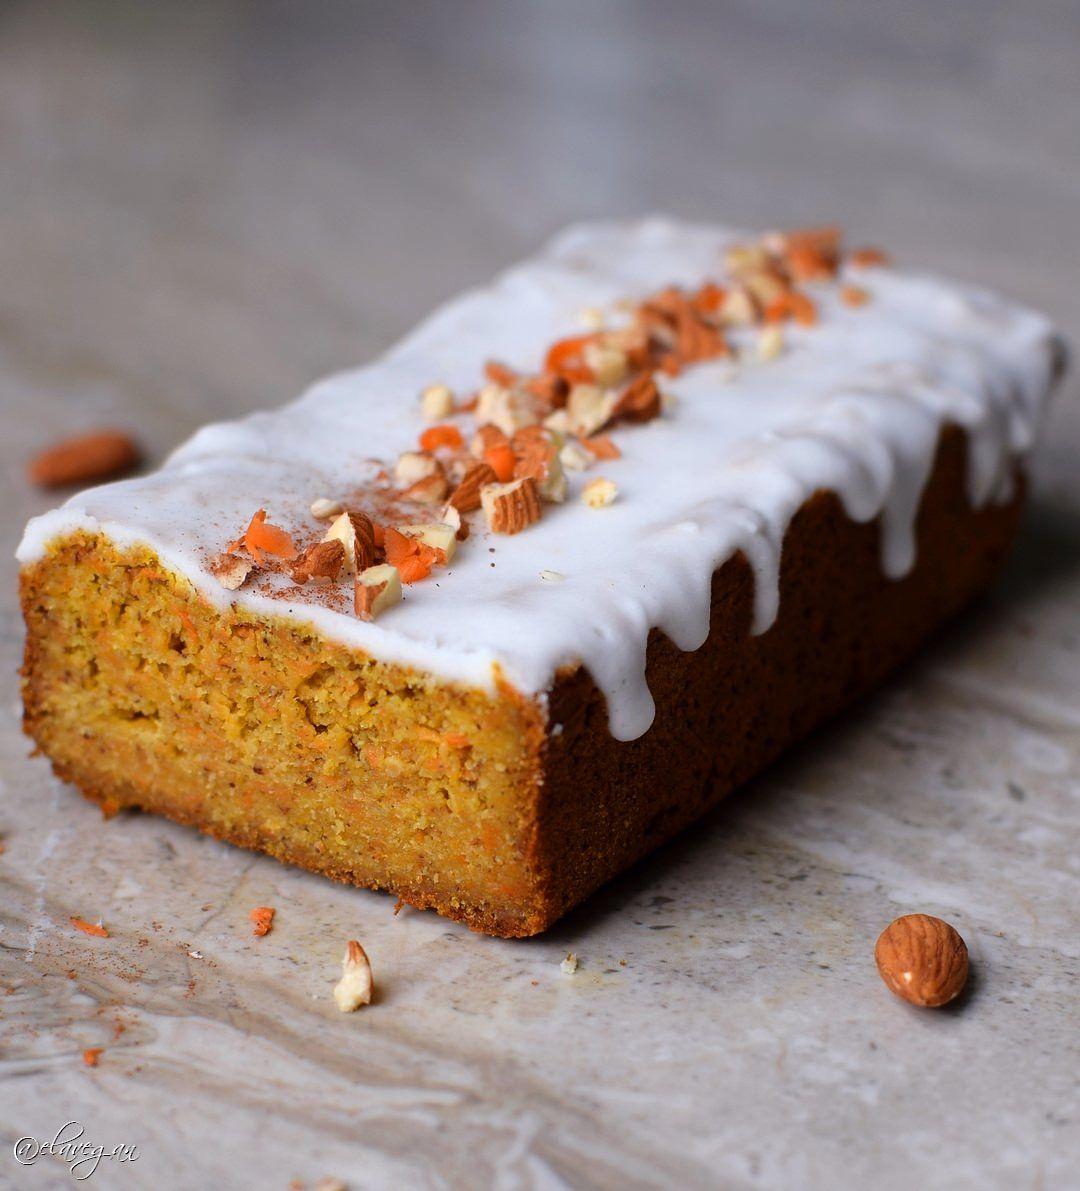 Recipe for a sugar free carrot cake